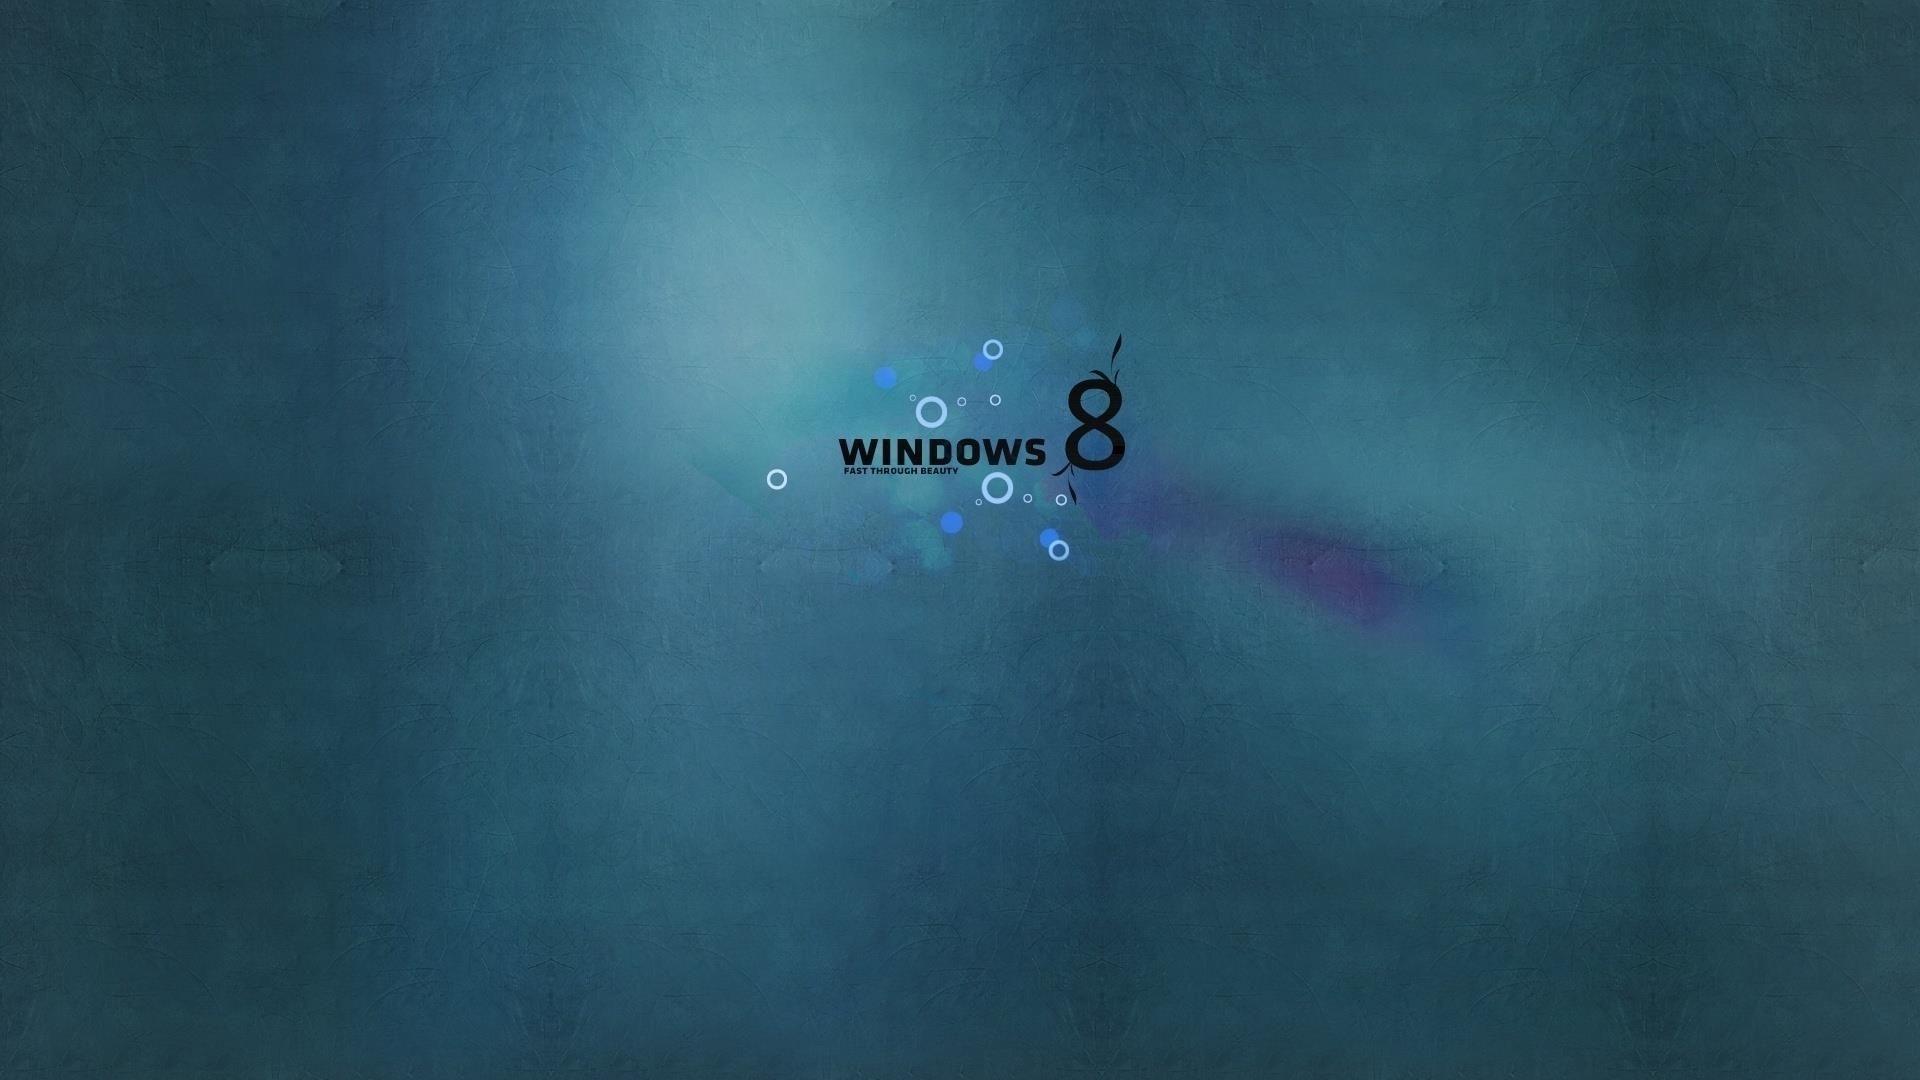 Windows8 Wallpapers Free Fonds D Ecran Gratuits By Unesourisetmoi Fond Ecran Samsung Fond D Ecran Sympa Fond Ecran